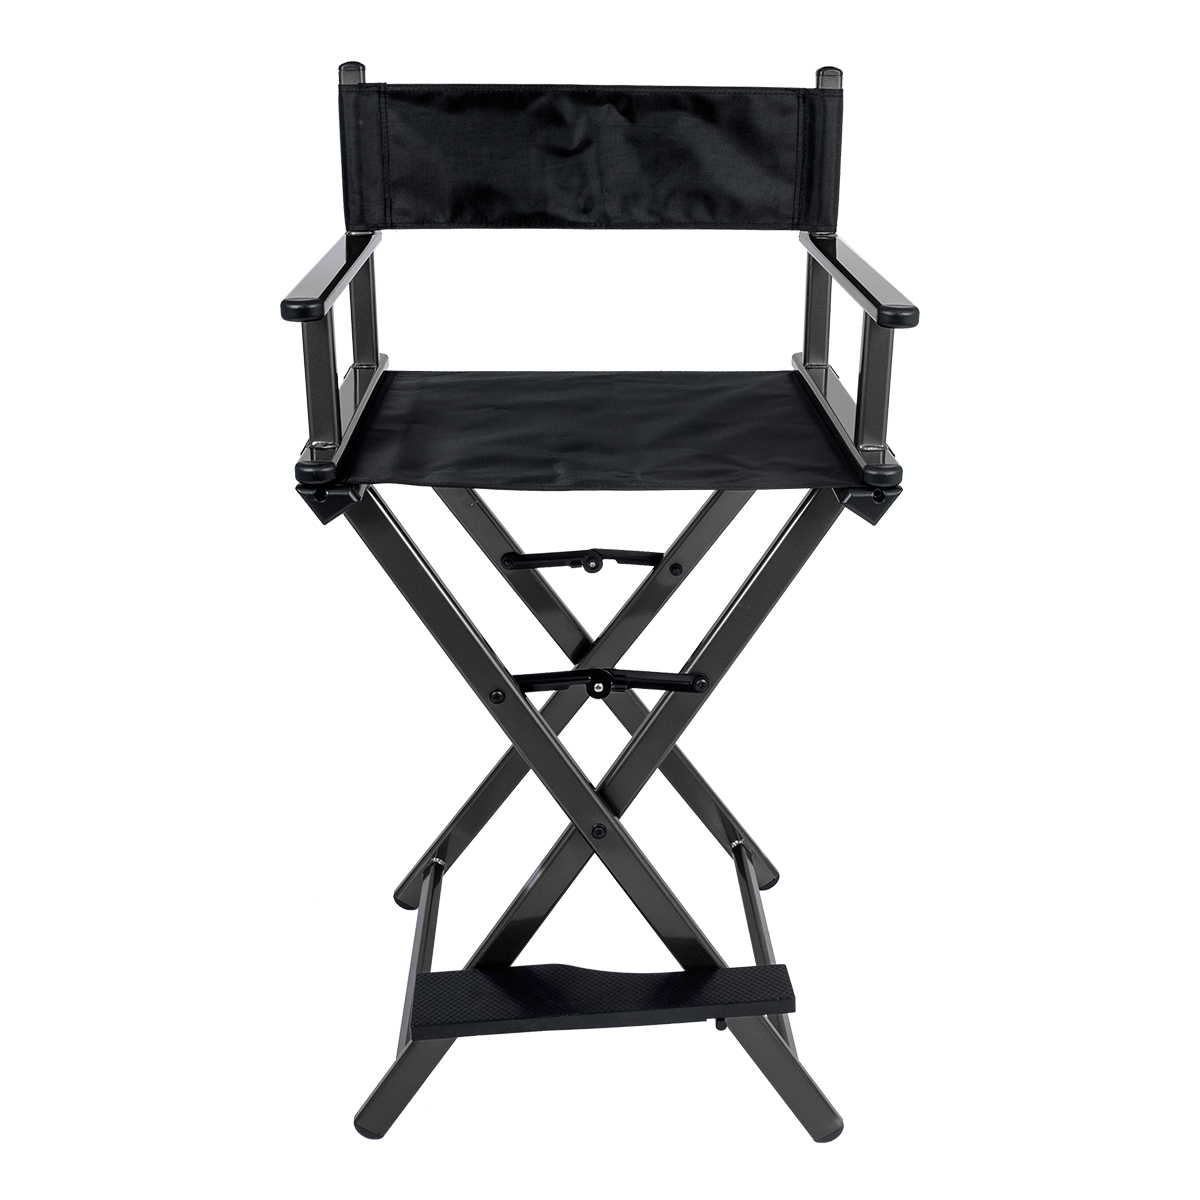 Cadeira Maquiador Diretor Cinema Alumínio Pelegrin PEL-Y001 Preta